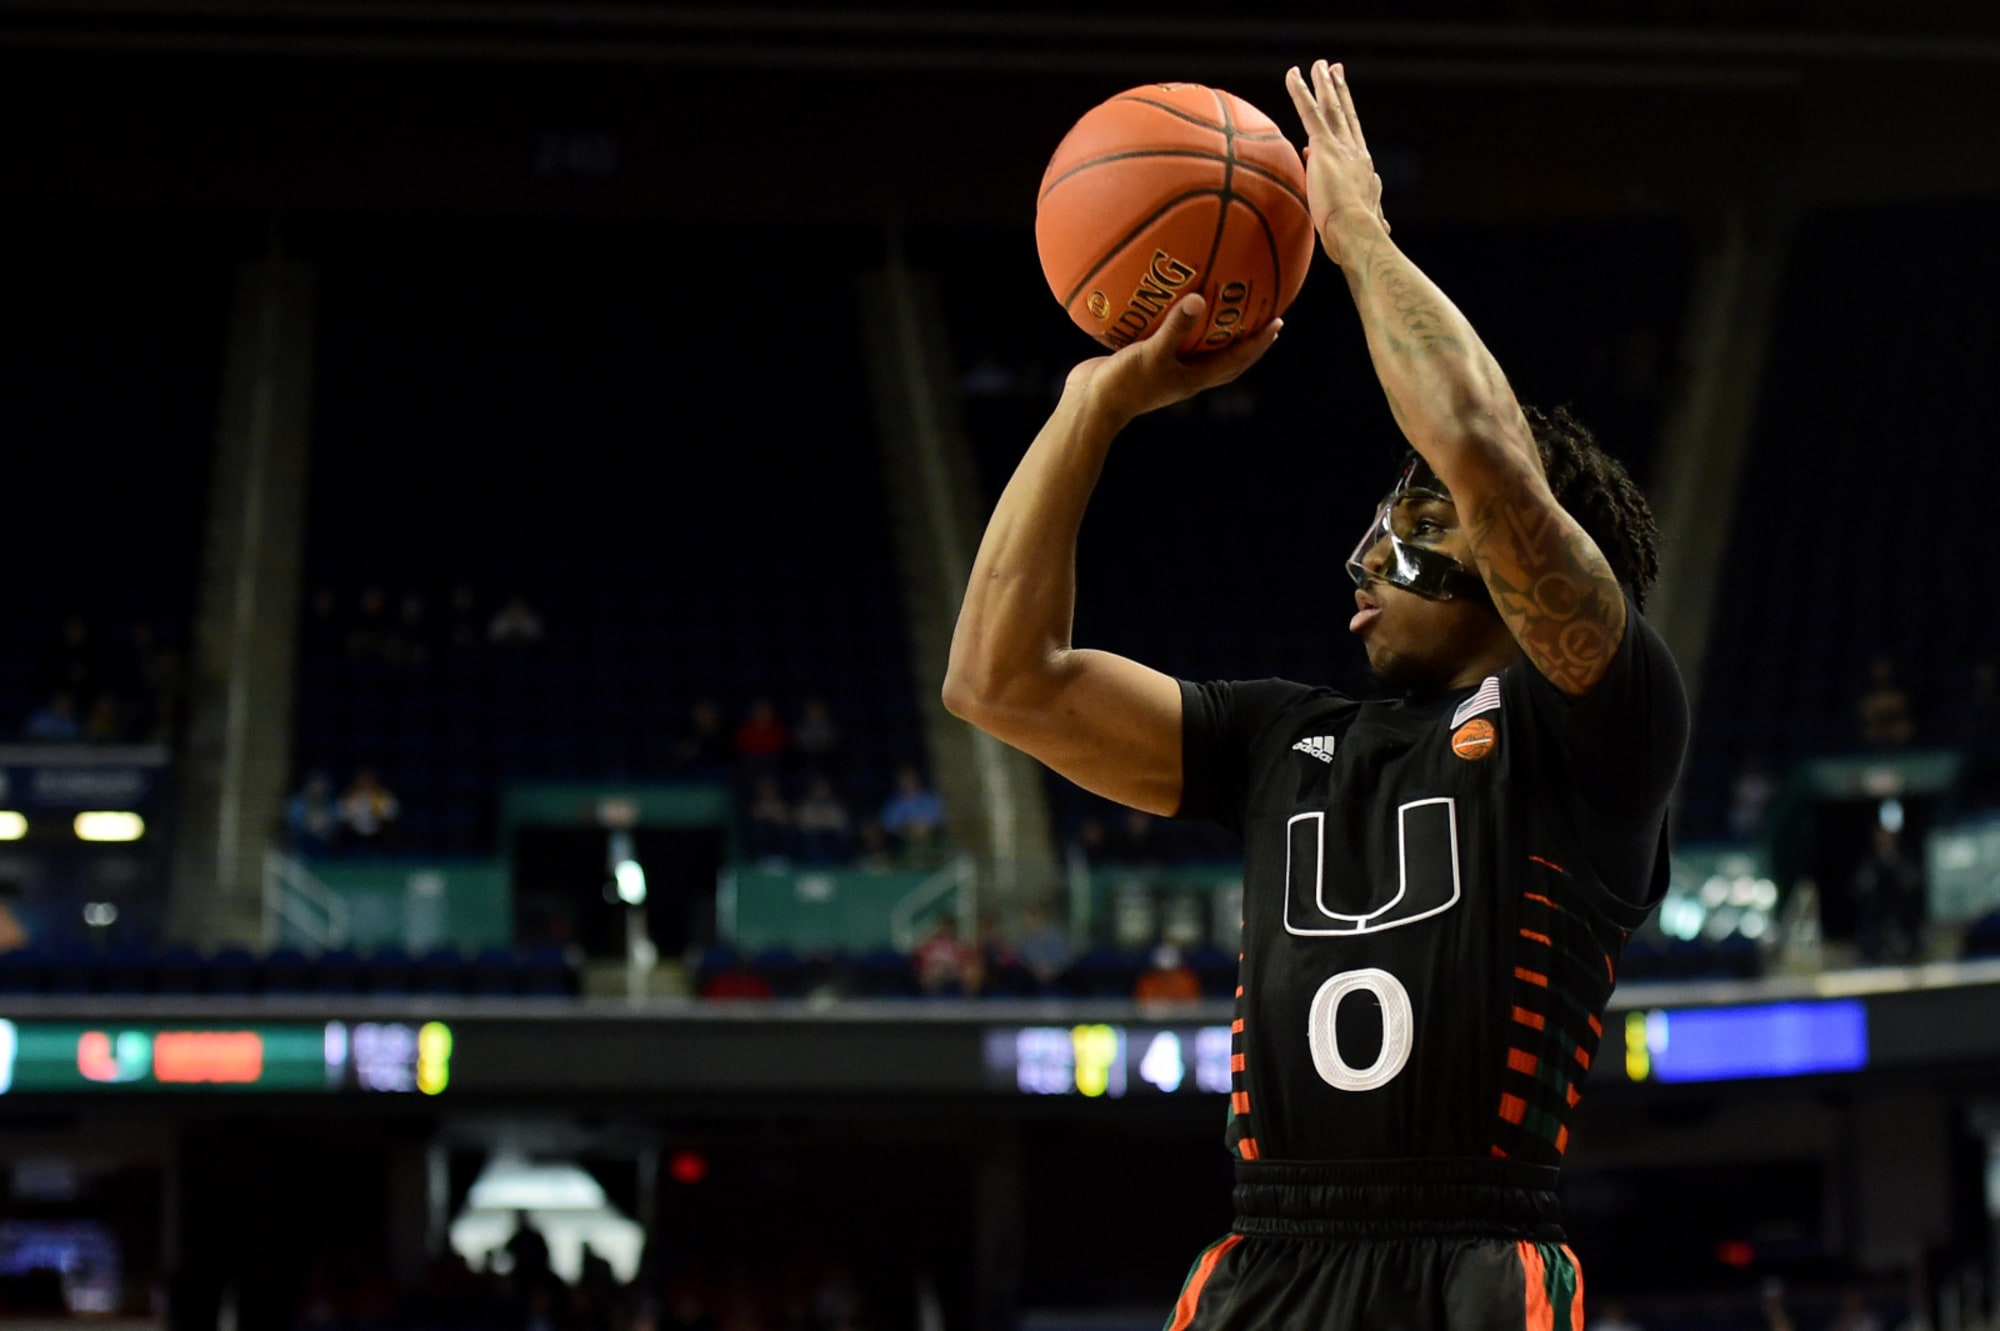 NCAA Basketball: Ranking all 8 teams in 2020 Cayman Islands Classic